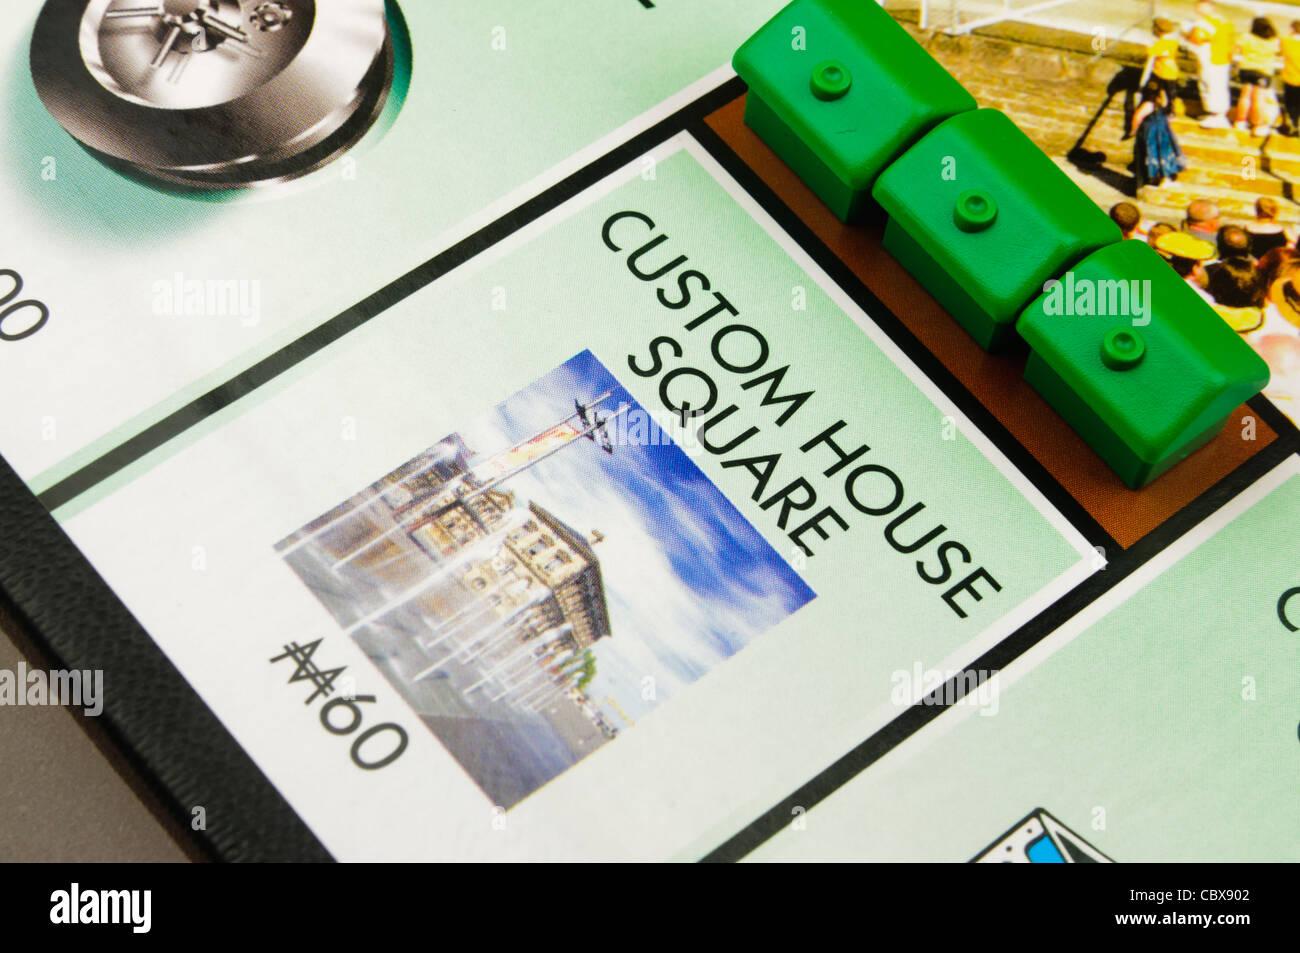 Belfast-Monopol: Bau von Häusern auf Custom House Square Stockbild